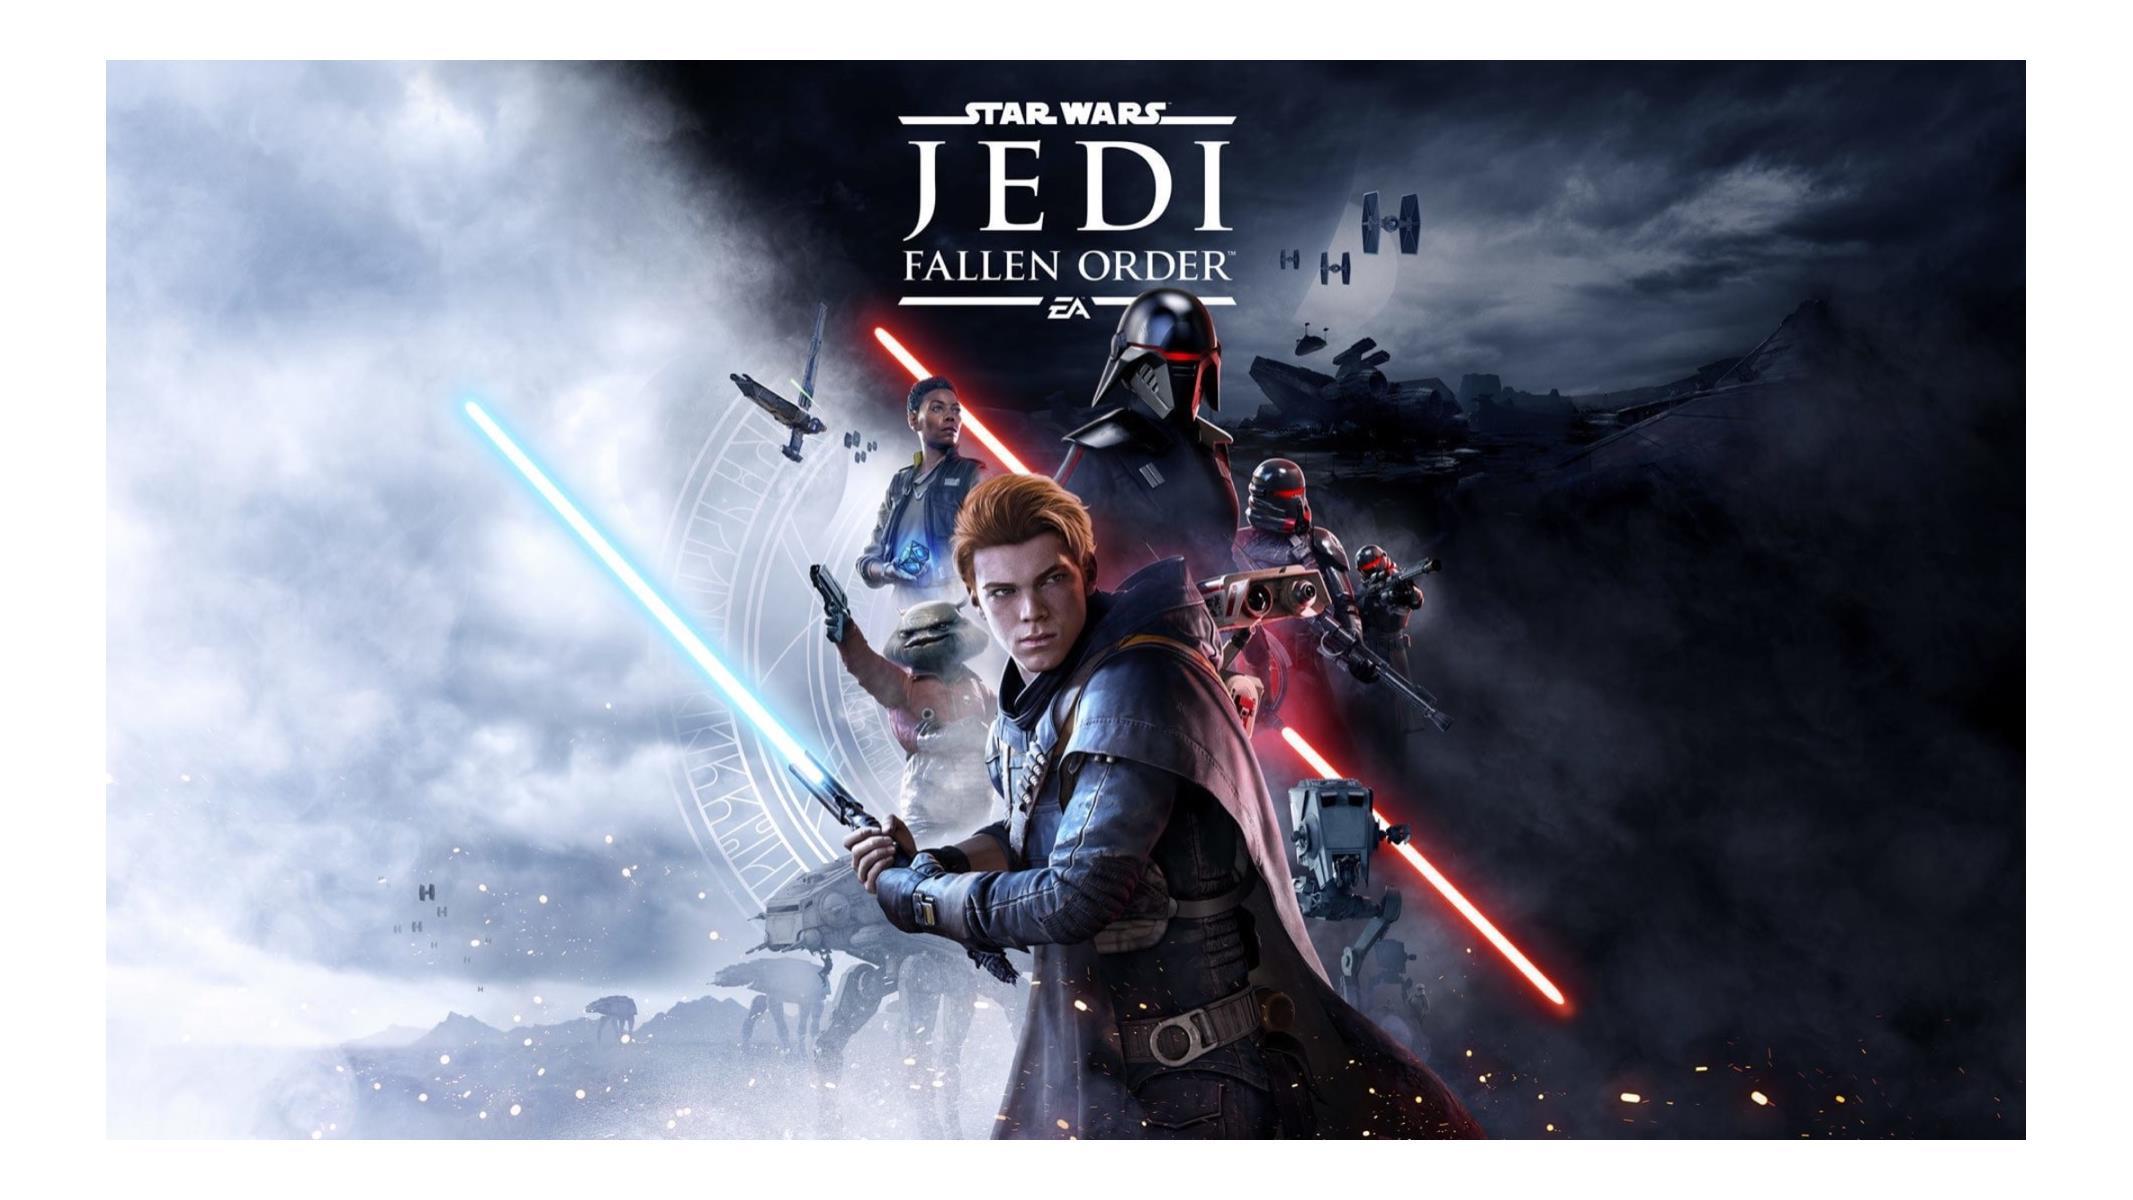 Star Wars Jedi Fallen Order Blitzes E3 With This Thrilling 14